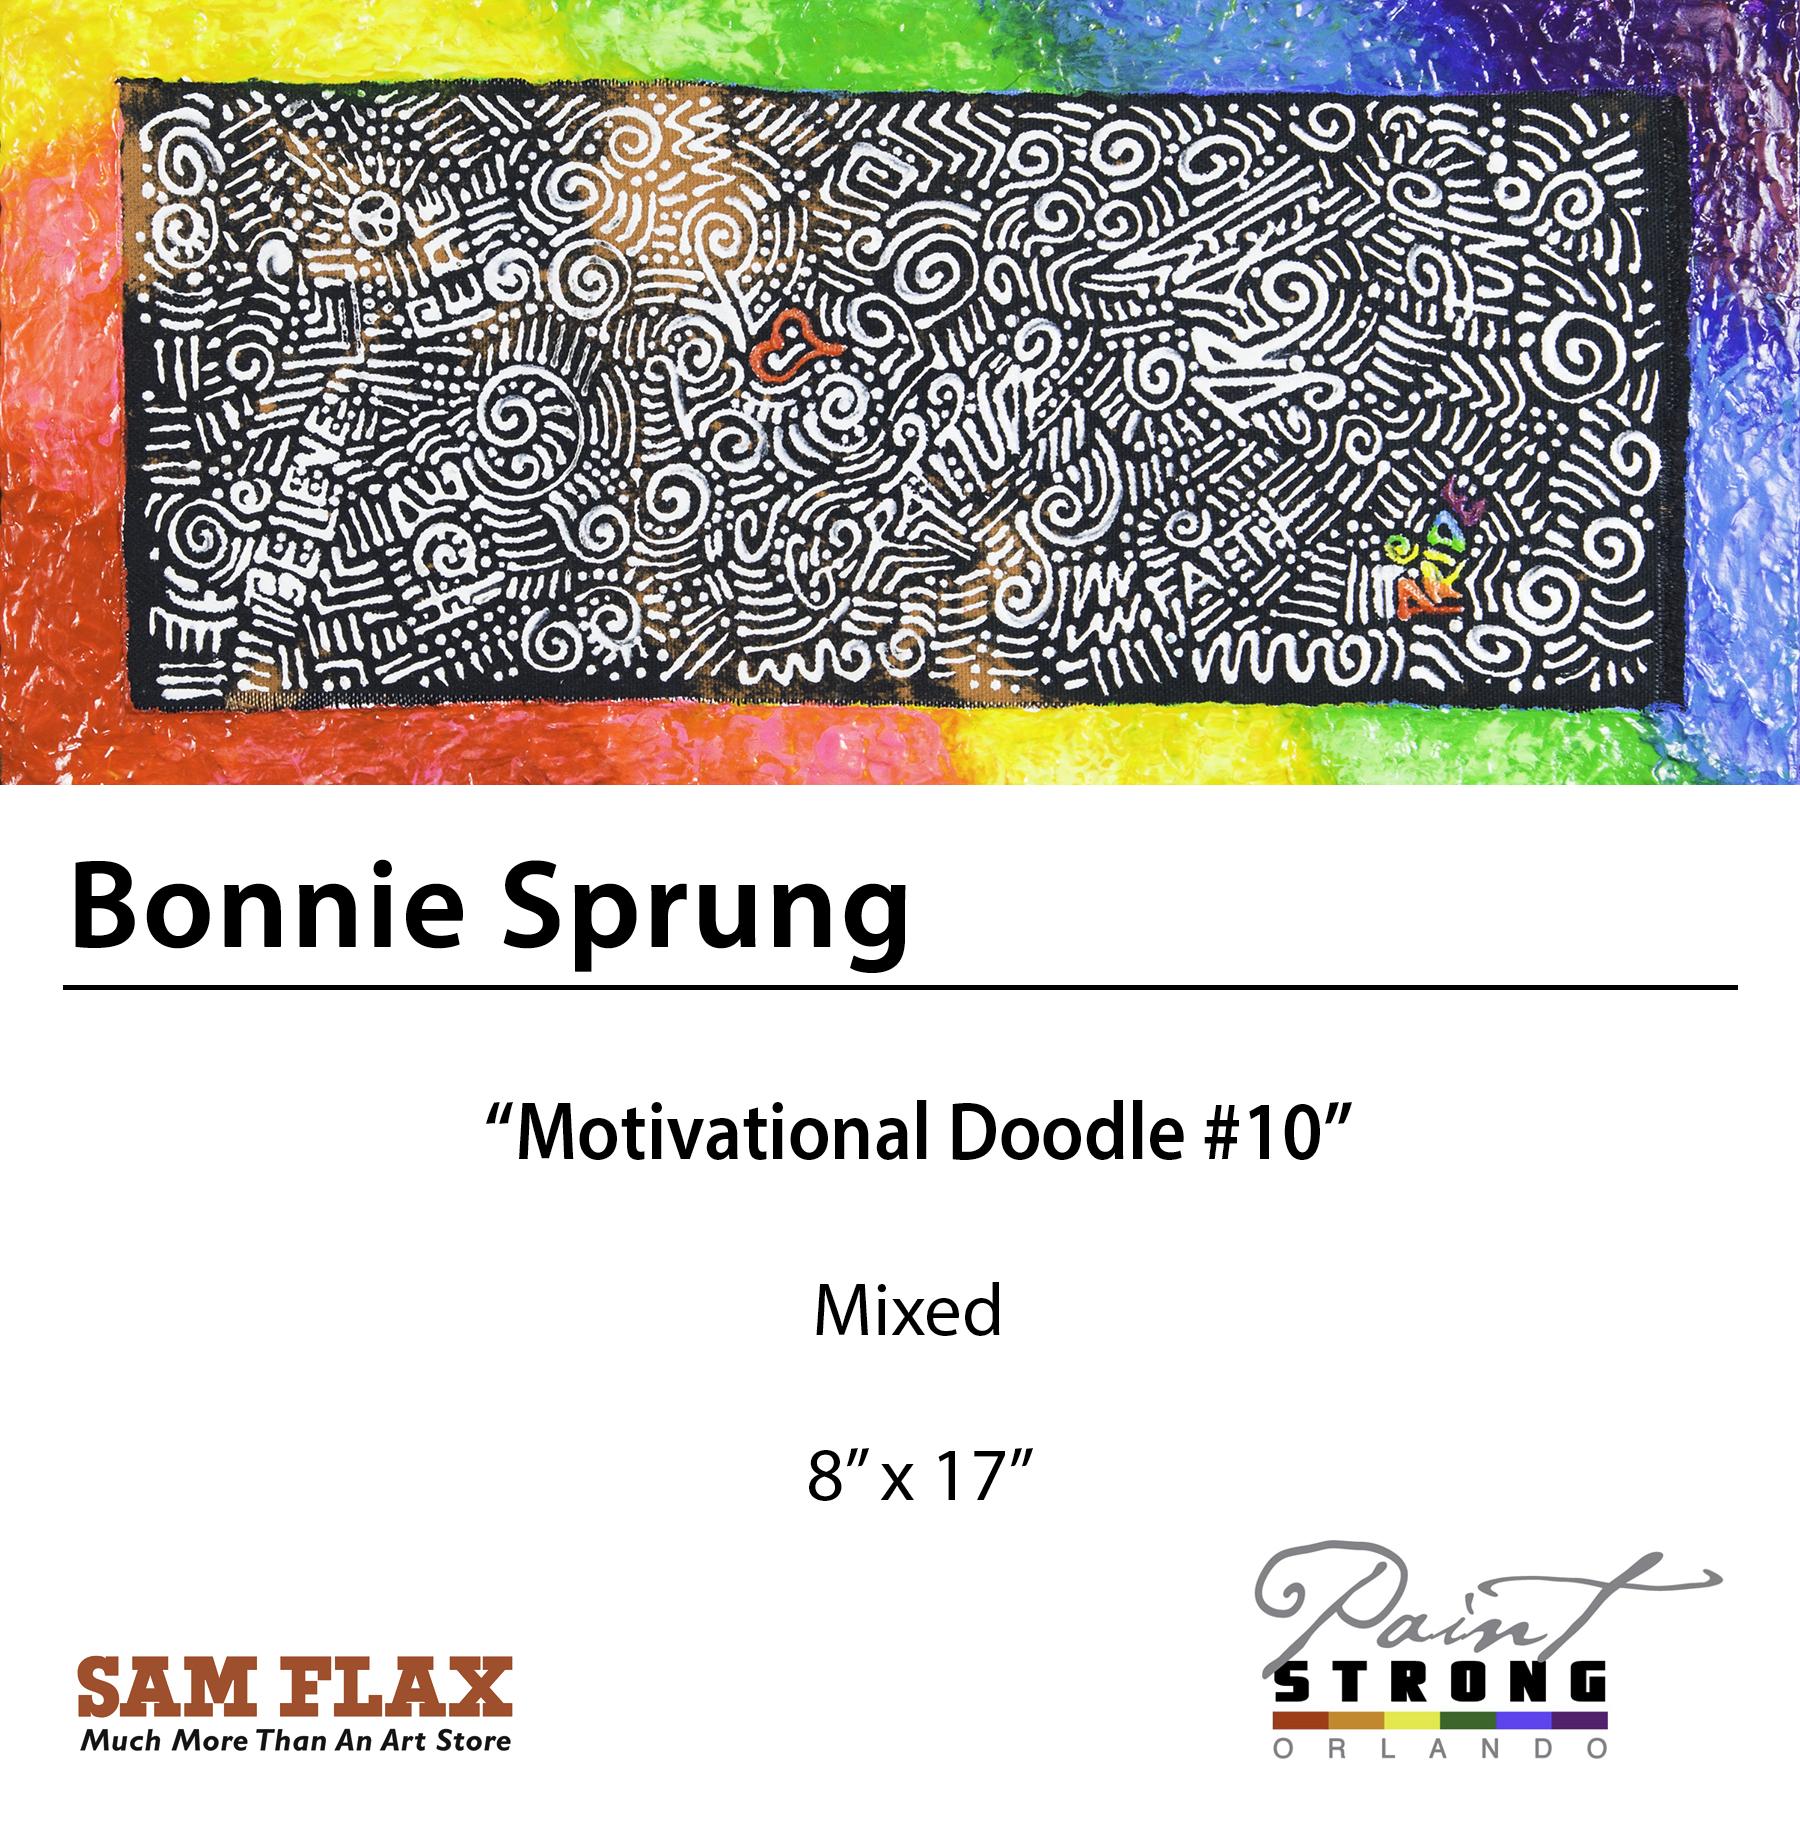 Bonnie Sprung